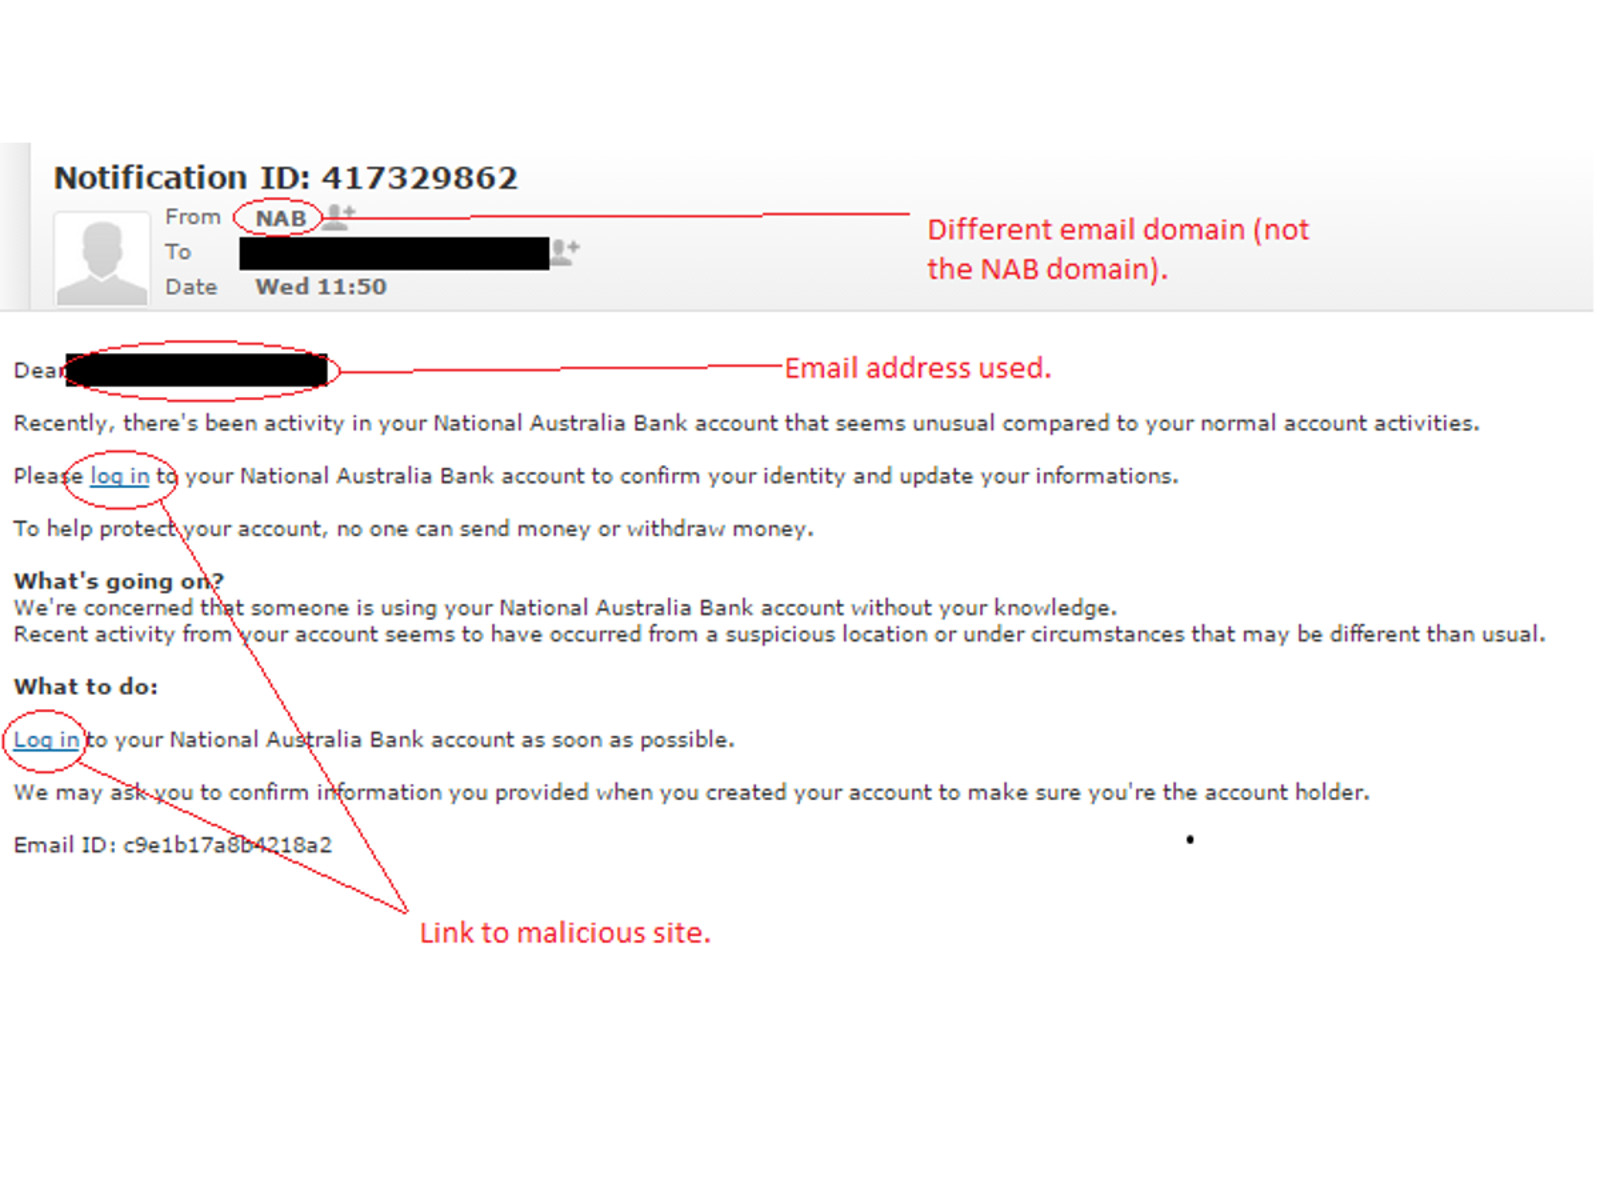 MailShark Latest email phish targets NAB customers